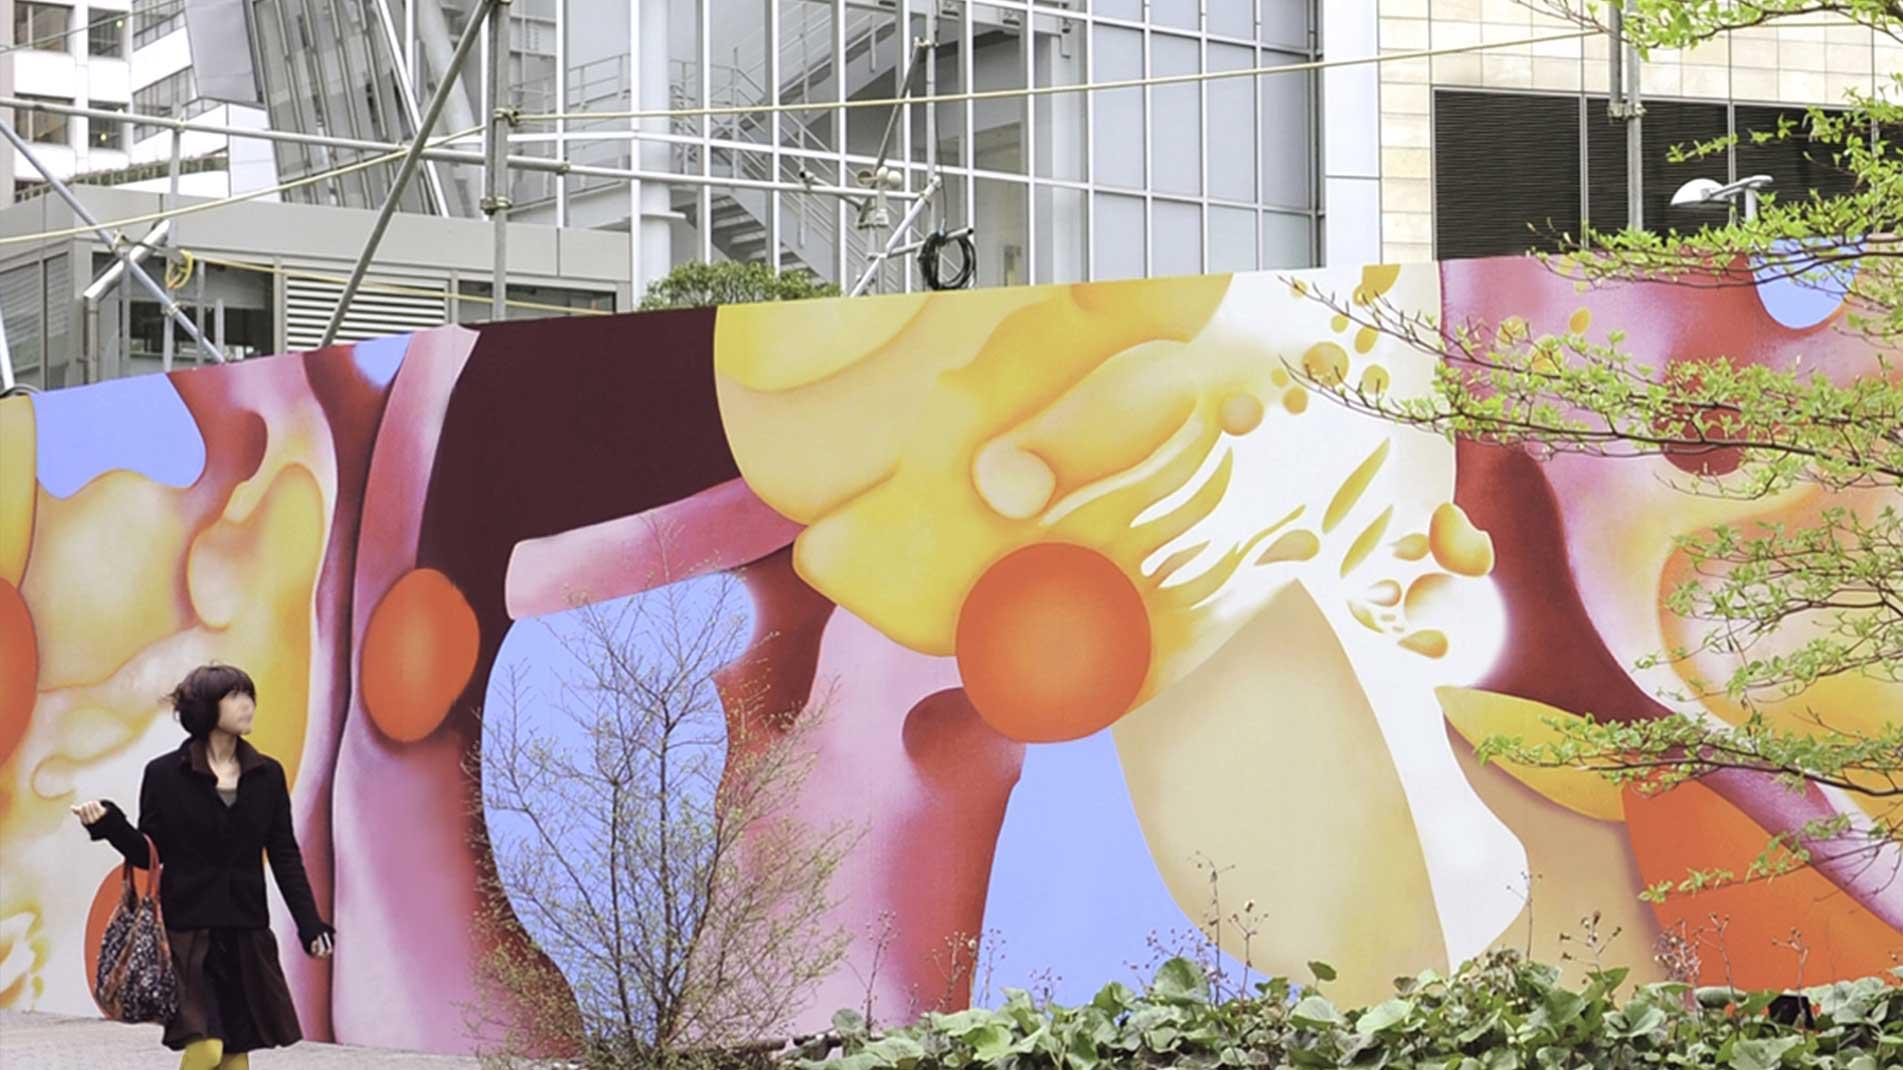 Bottazzi - Art public - 3,30m x 33m © - Tokyo, Roppongi, Japon ©